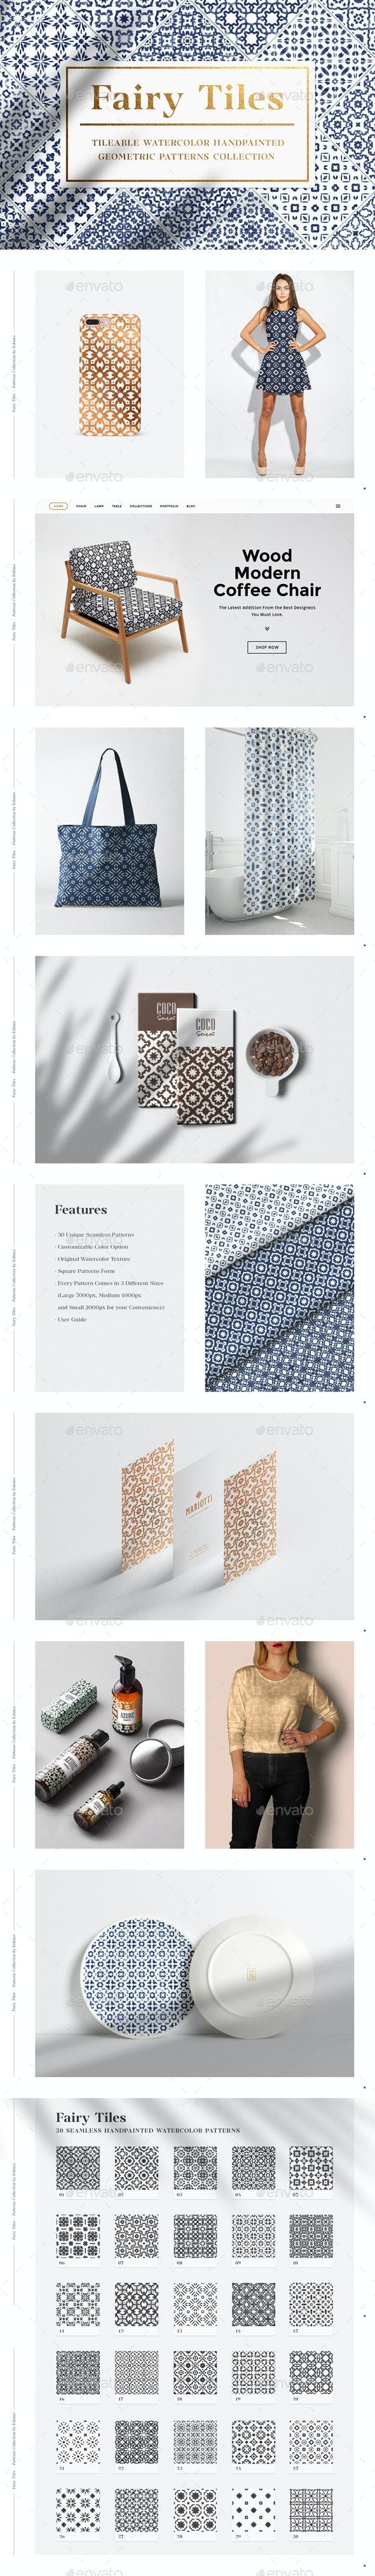 30 Geometric Watercolor Patterns - Patterns Backgrounds